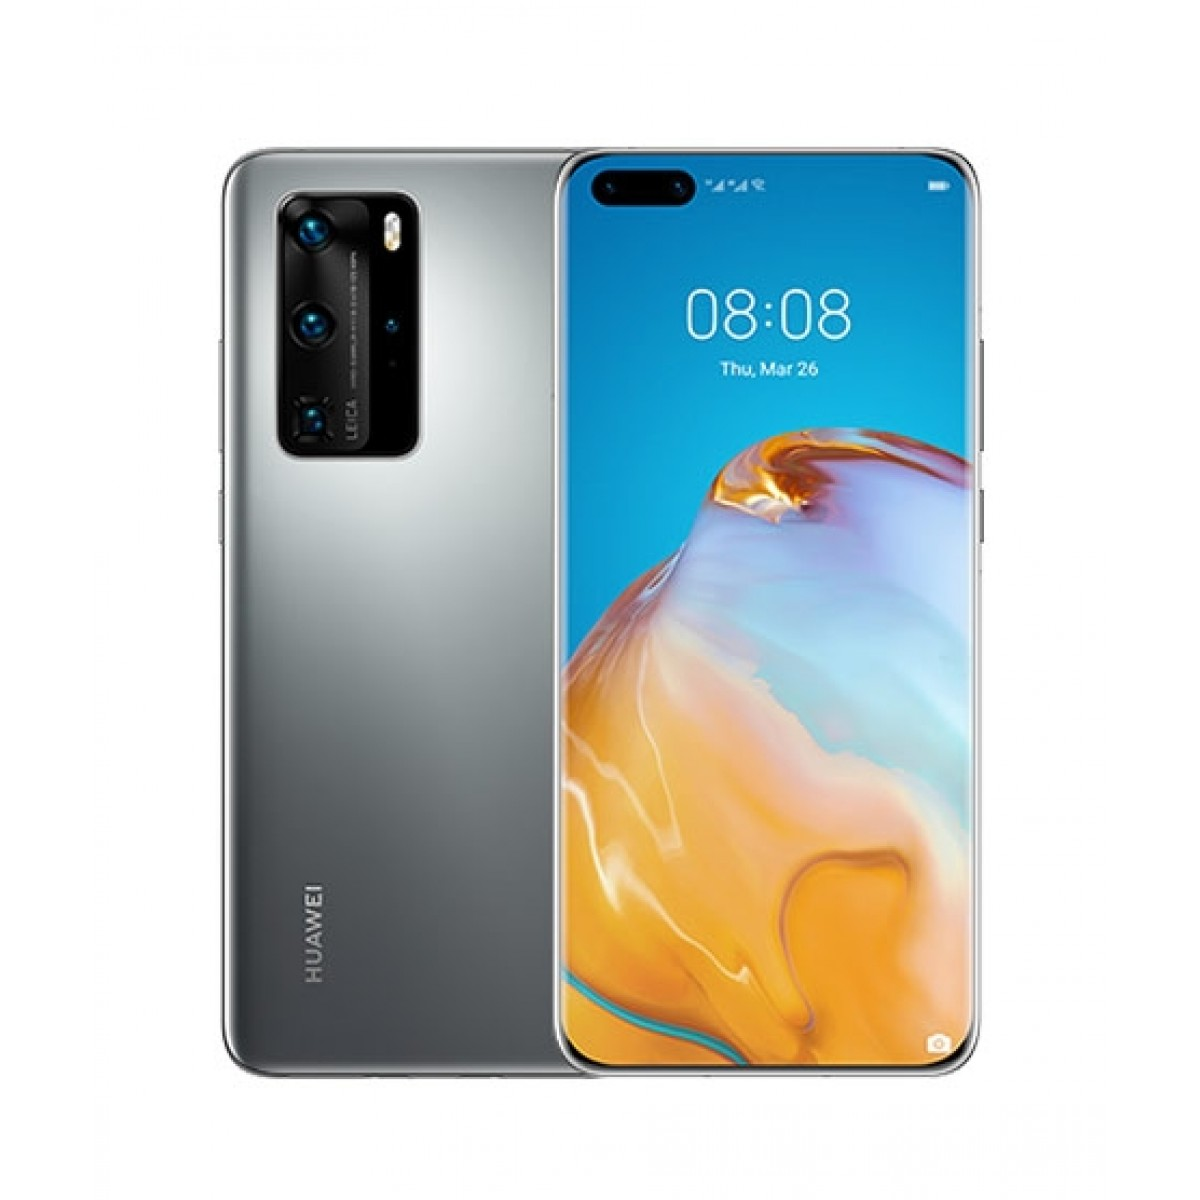 Huawei P40 Pro 256GB 8GB Dual Sim Silver - Non PTA Compliant